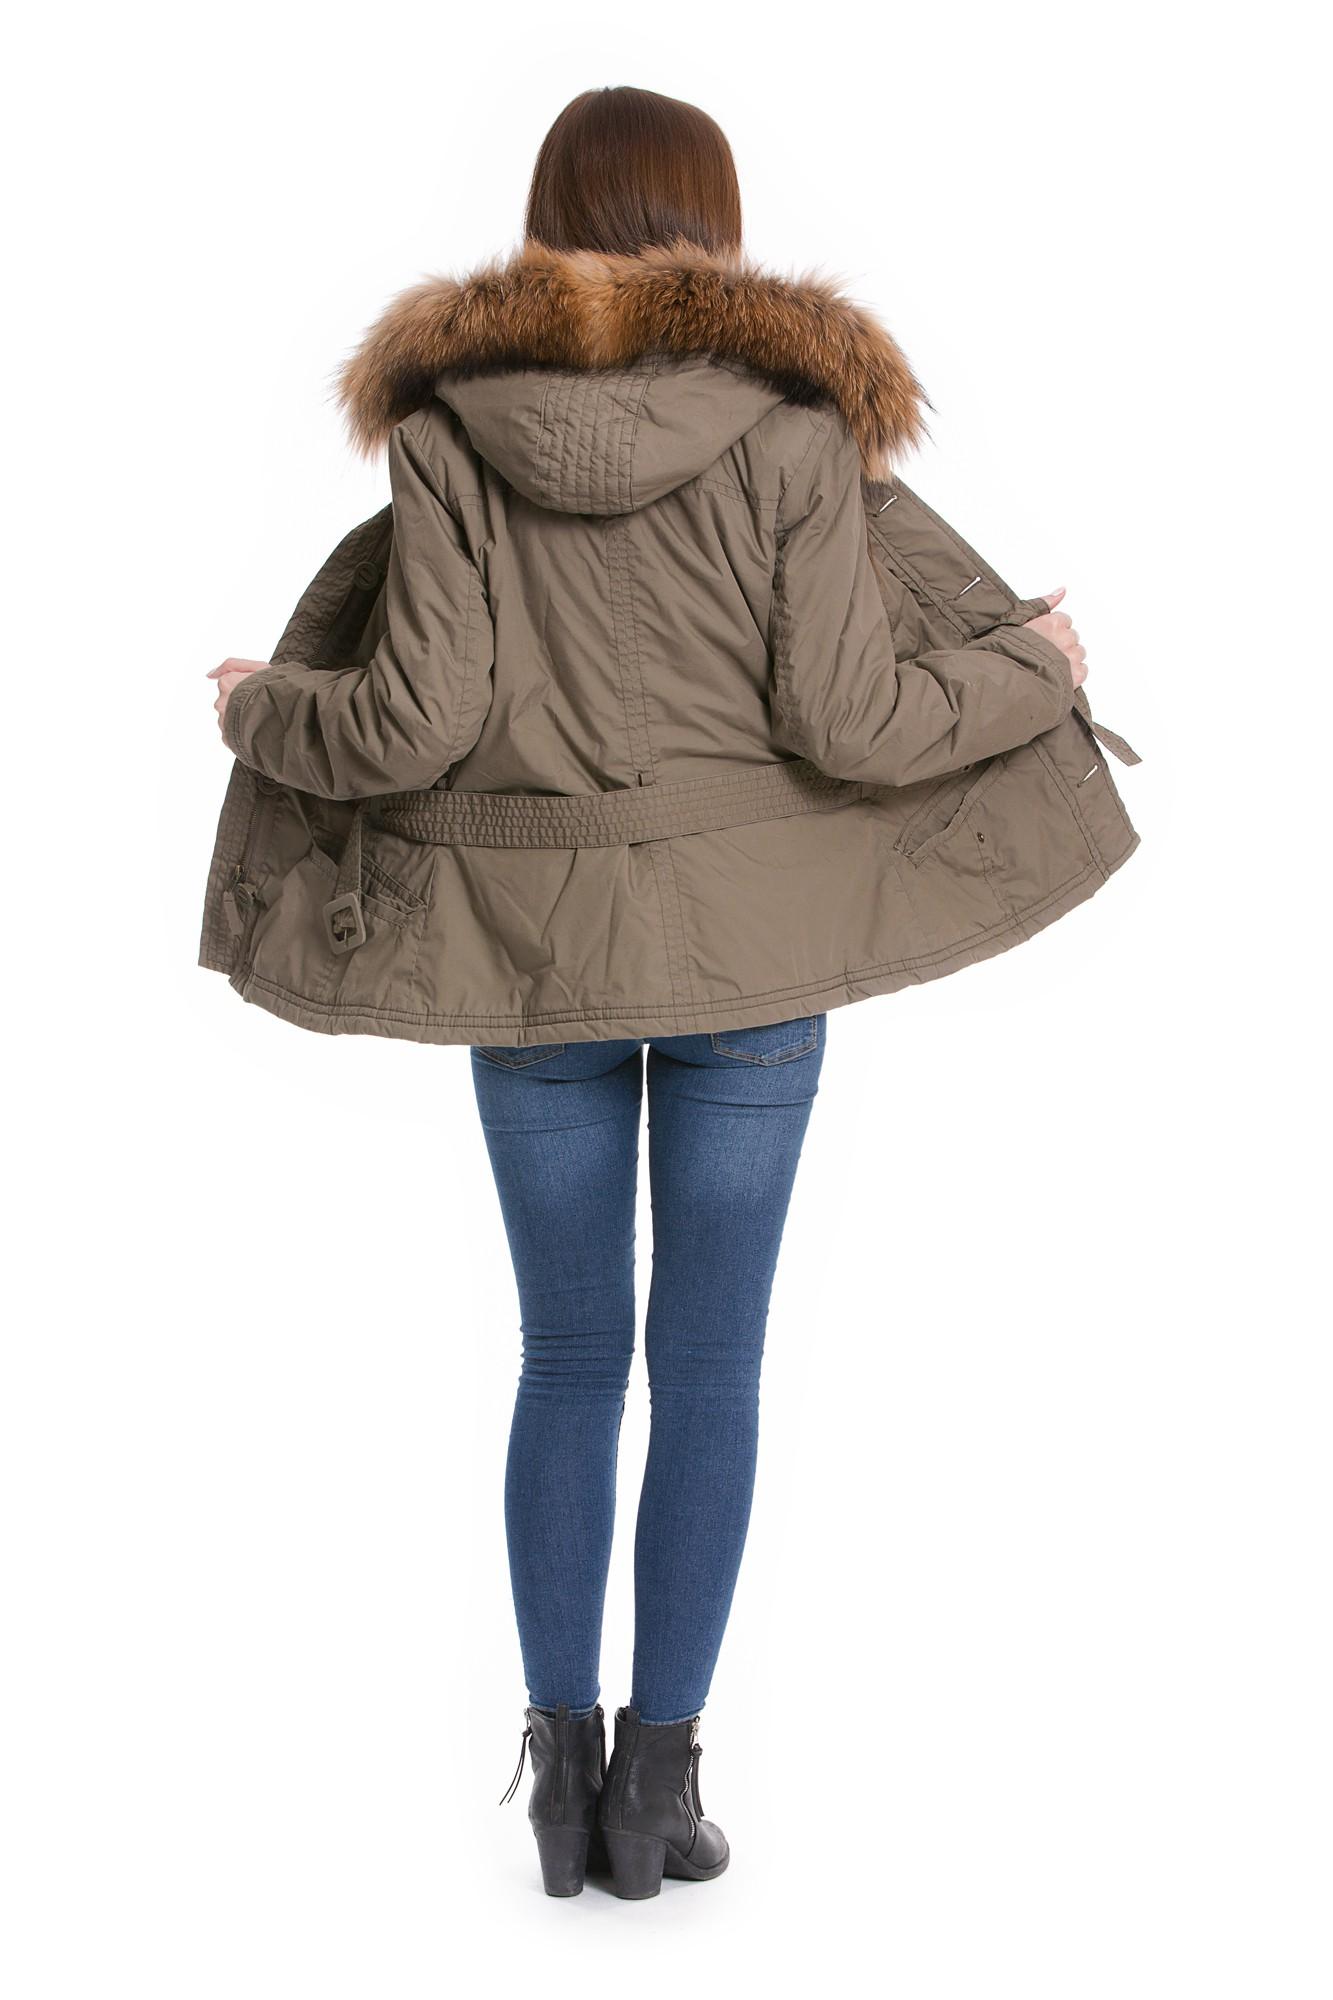 fellkapuze parka style kragen pelzstreifen fashion mode xxl ebay. Black Bedroom Furniture Sets. Home Design Ideas